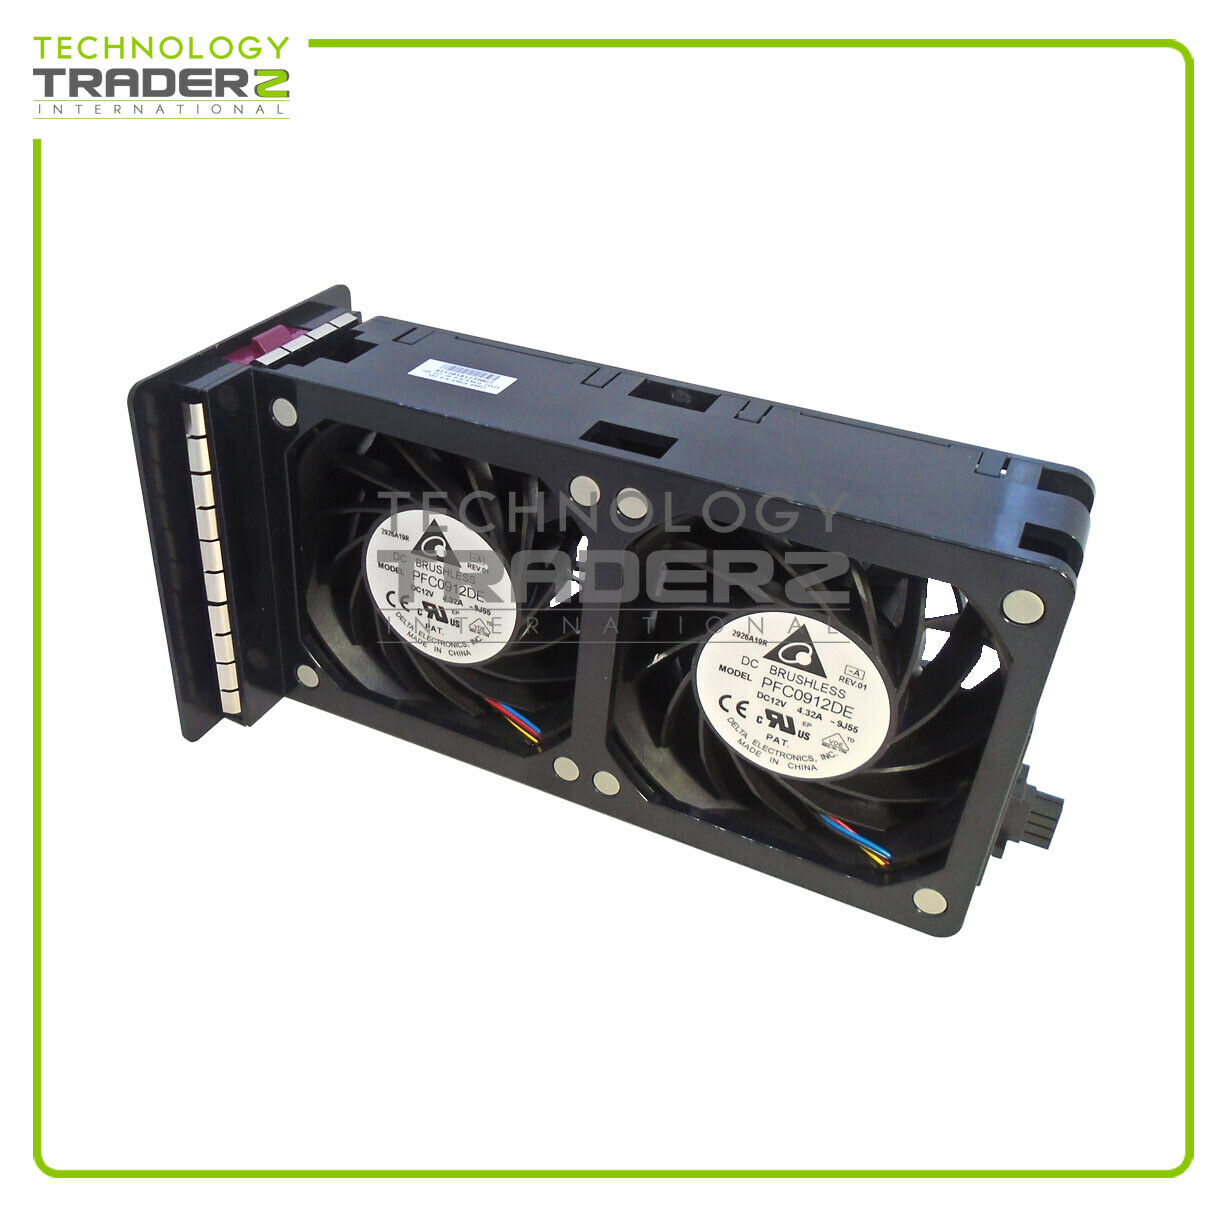 HP DL980G7 Lower CPU//Memory Drawer Assy AM426-2110A NO Memory Cartridge